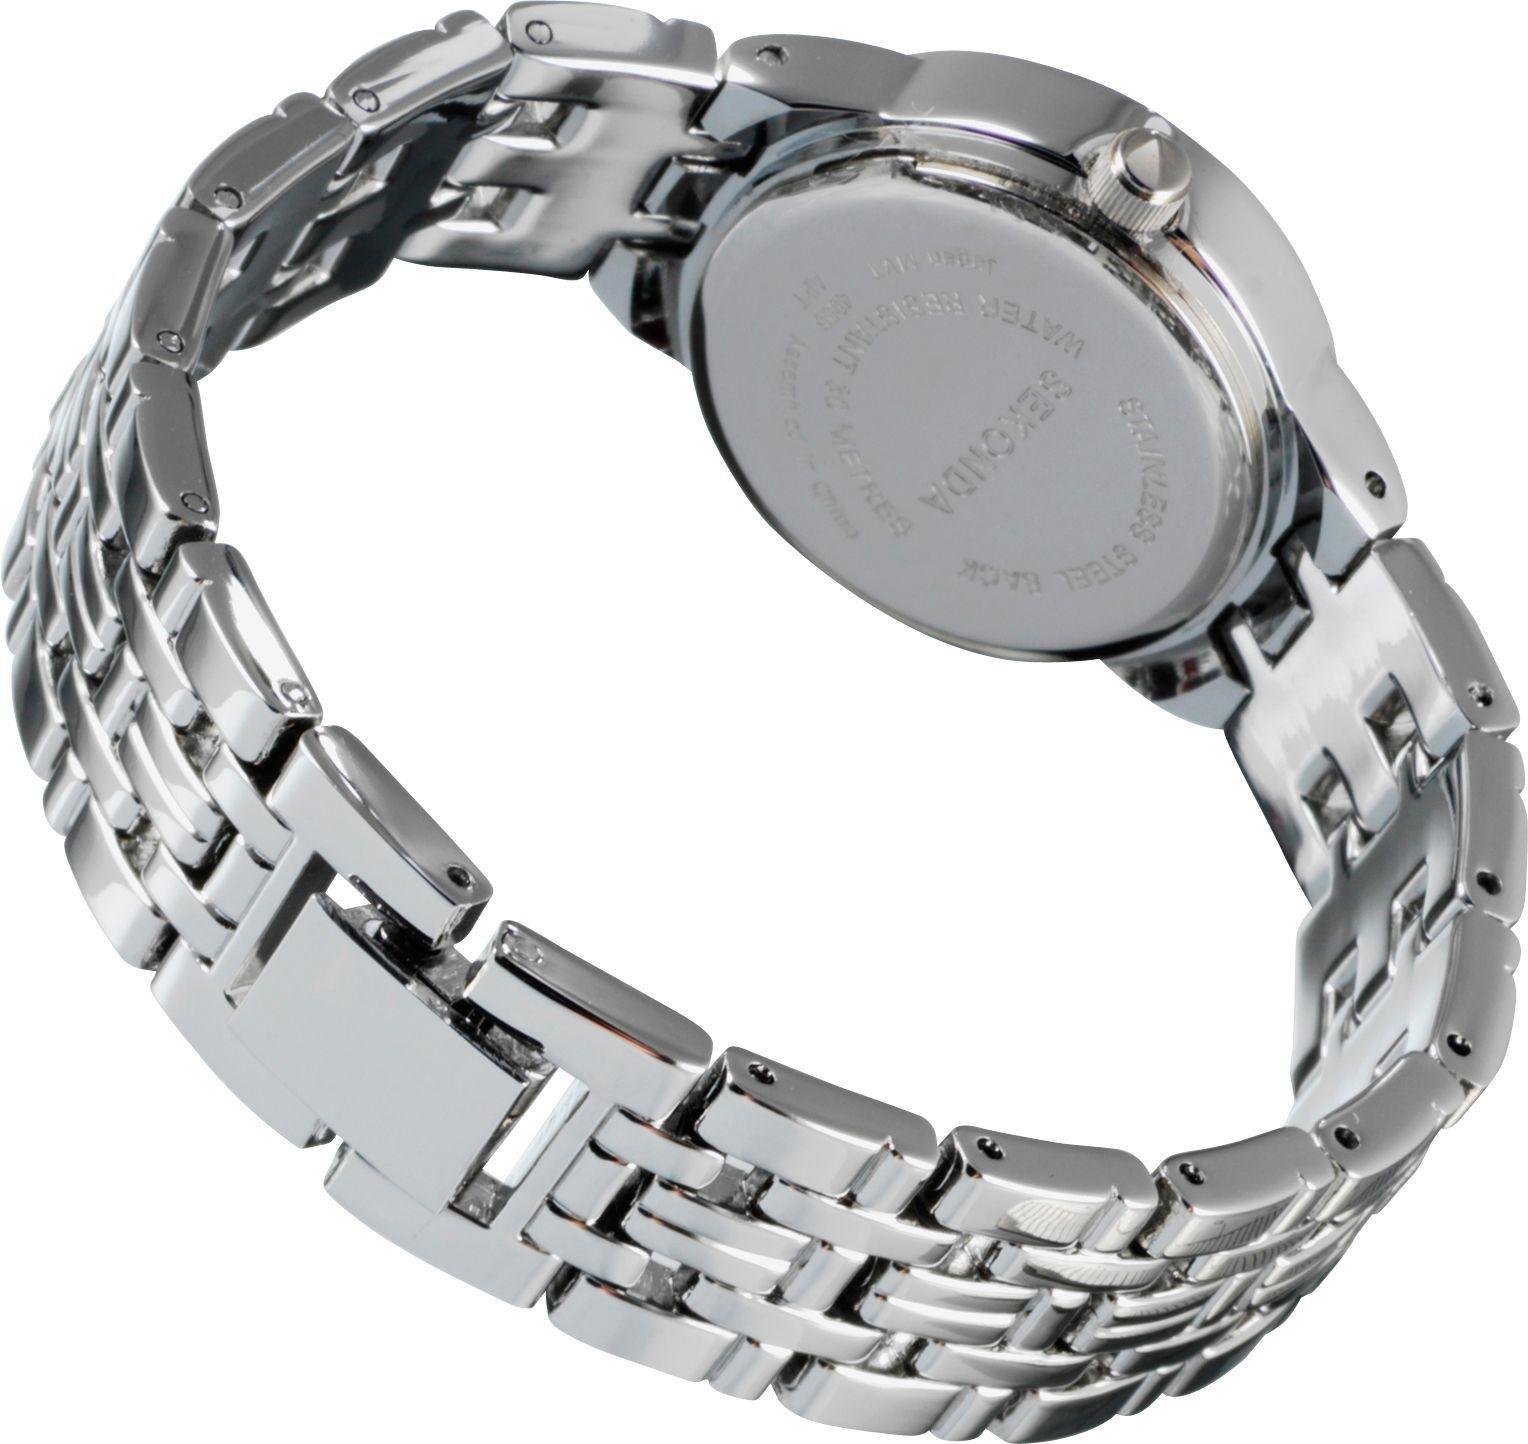 Buy Sekonda La s Diamond Set Bracelet Watch at Argos